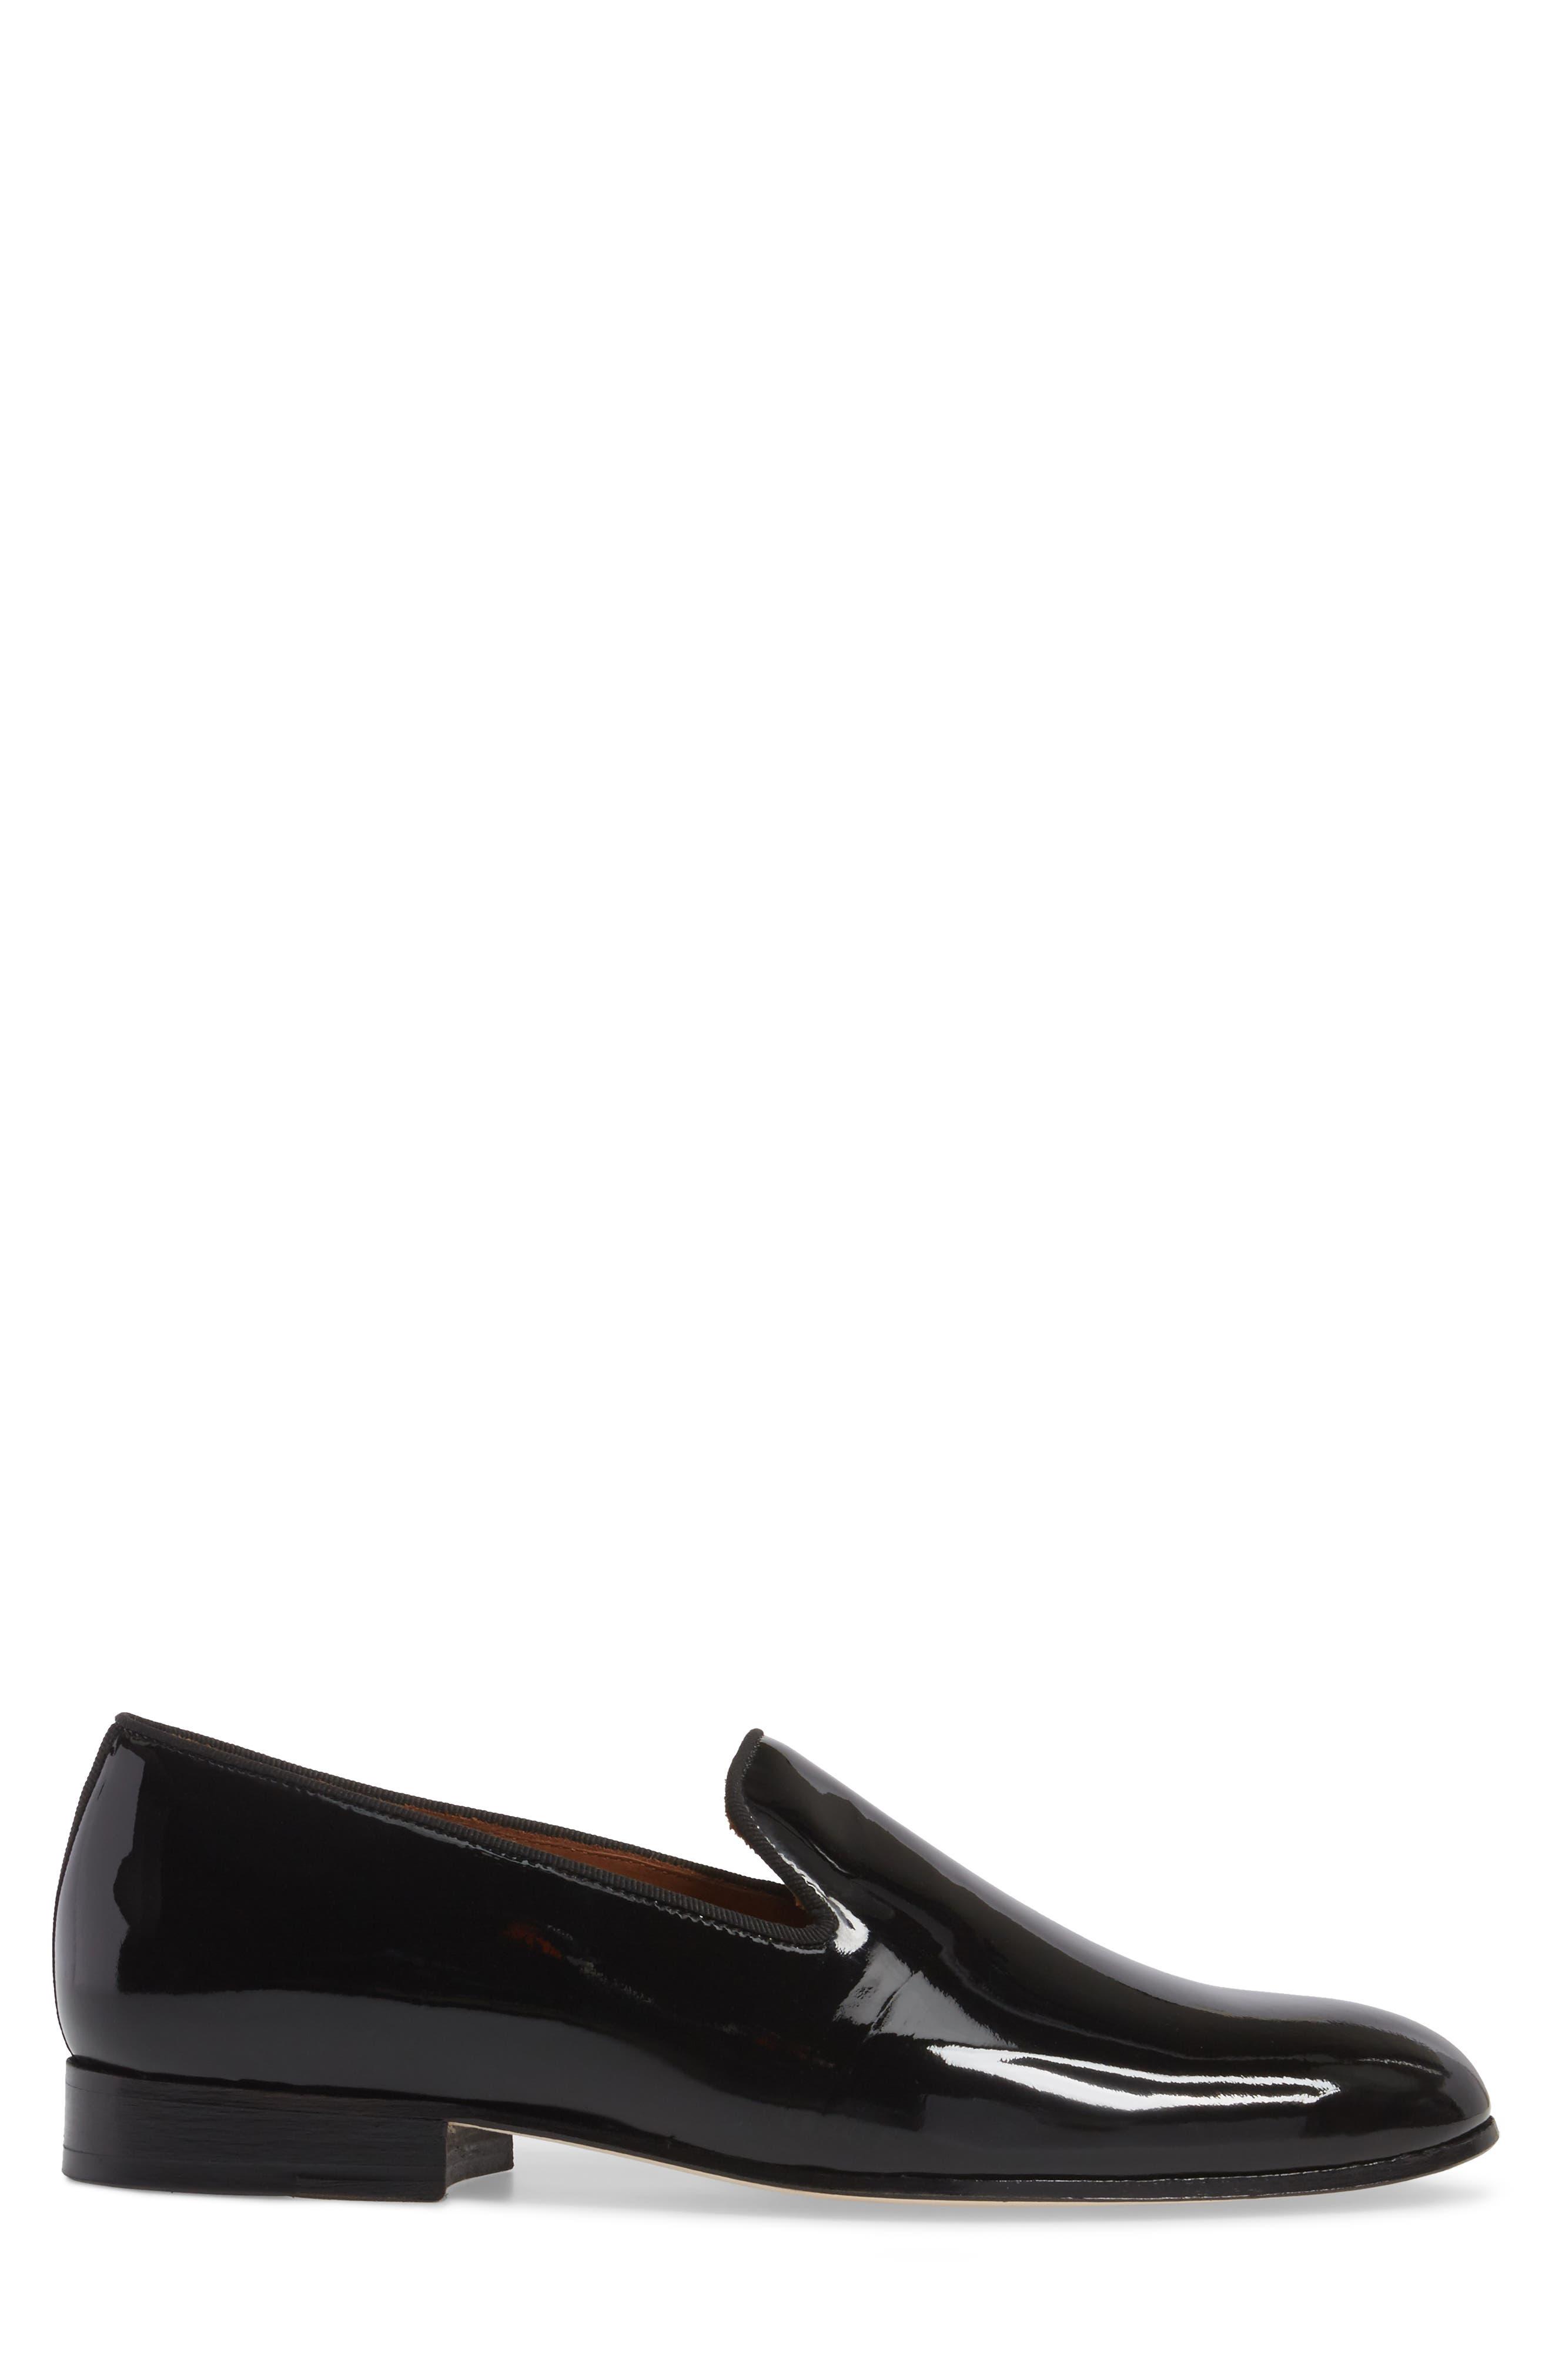 Bravi Loafer,                             Alternate thumbnail 3, color,                             Black Patent Leather